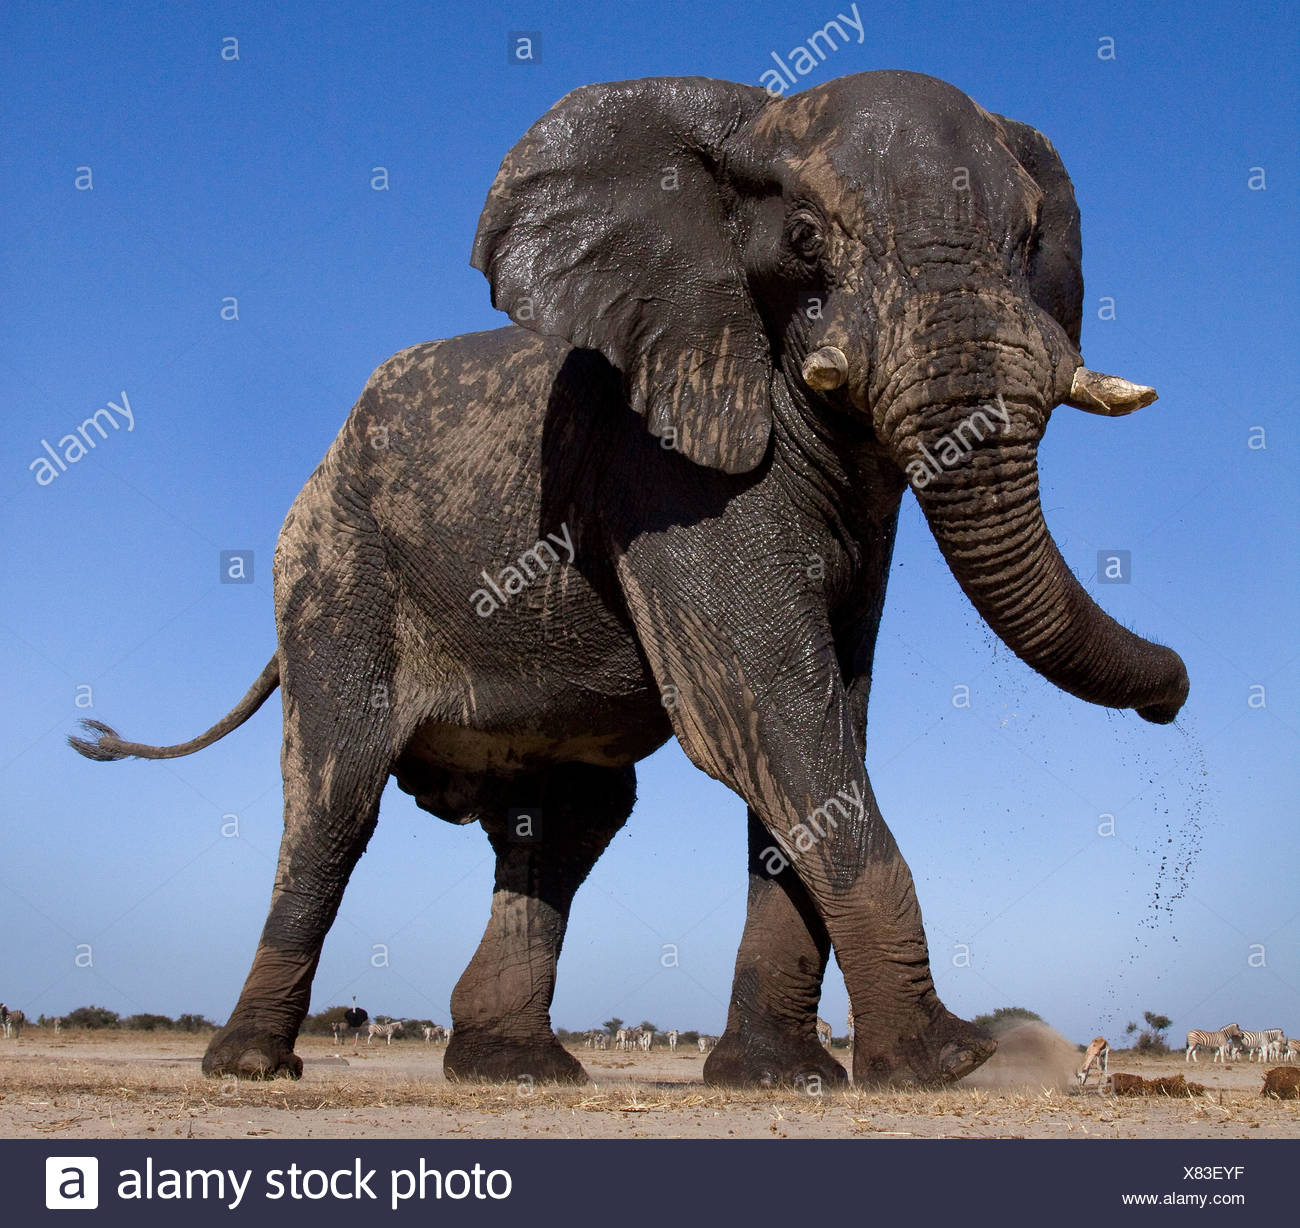 Basso angolo di elefante, Etosha Pan, Namibia Immagini Stock